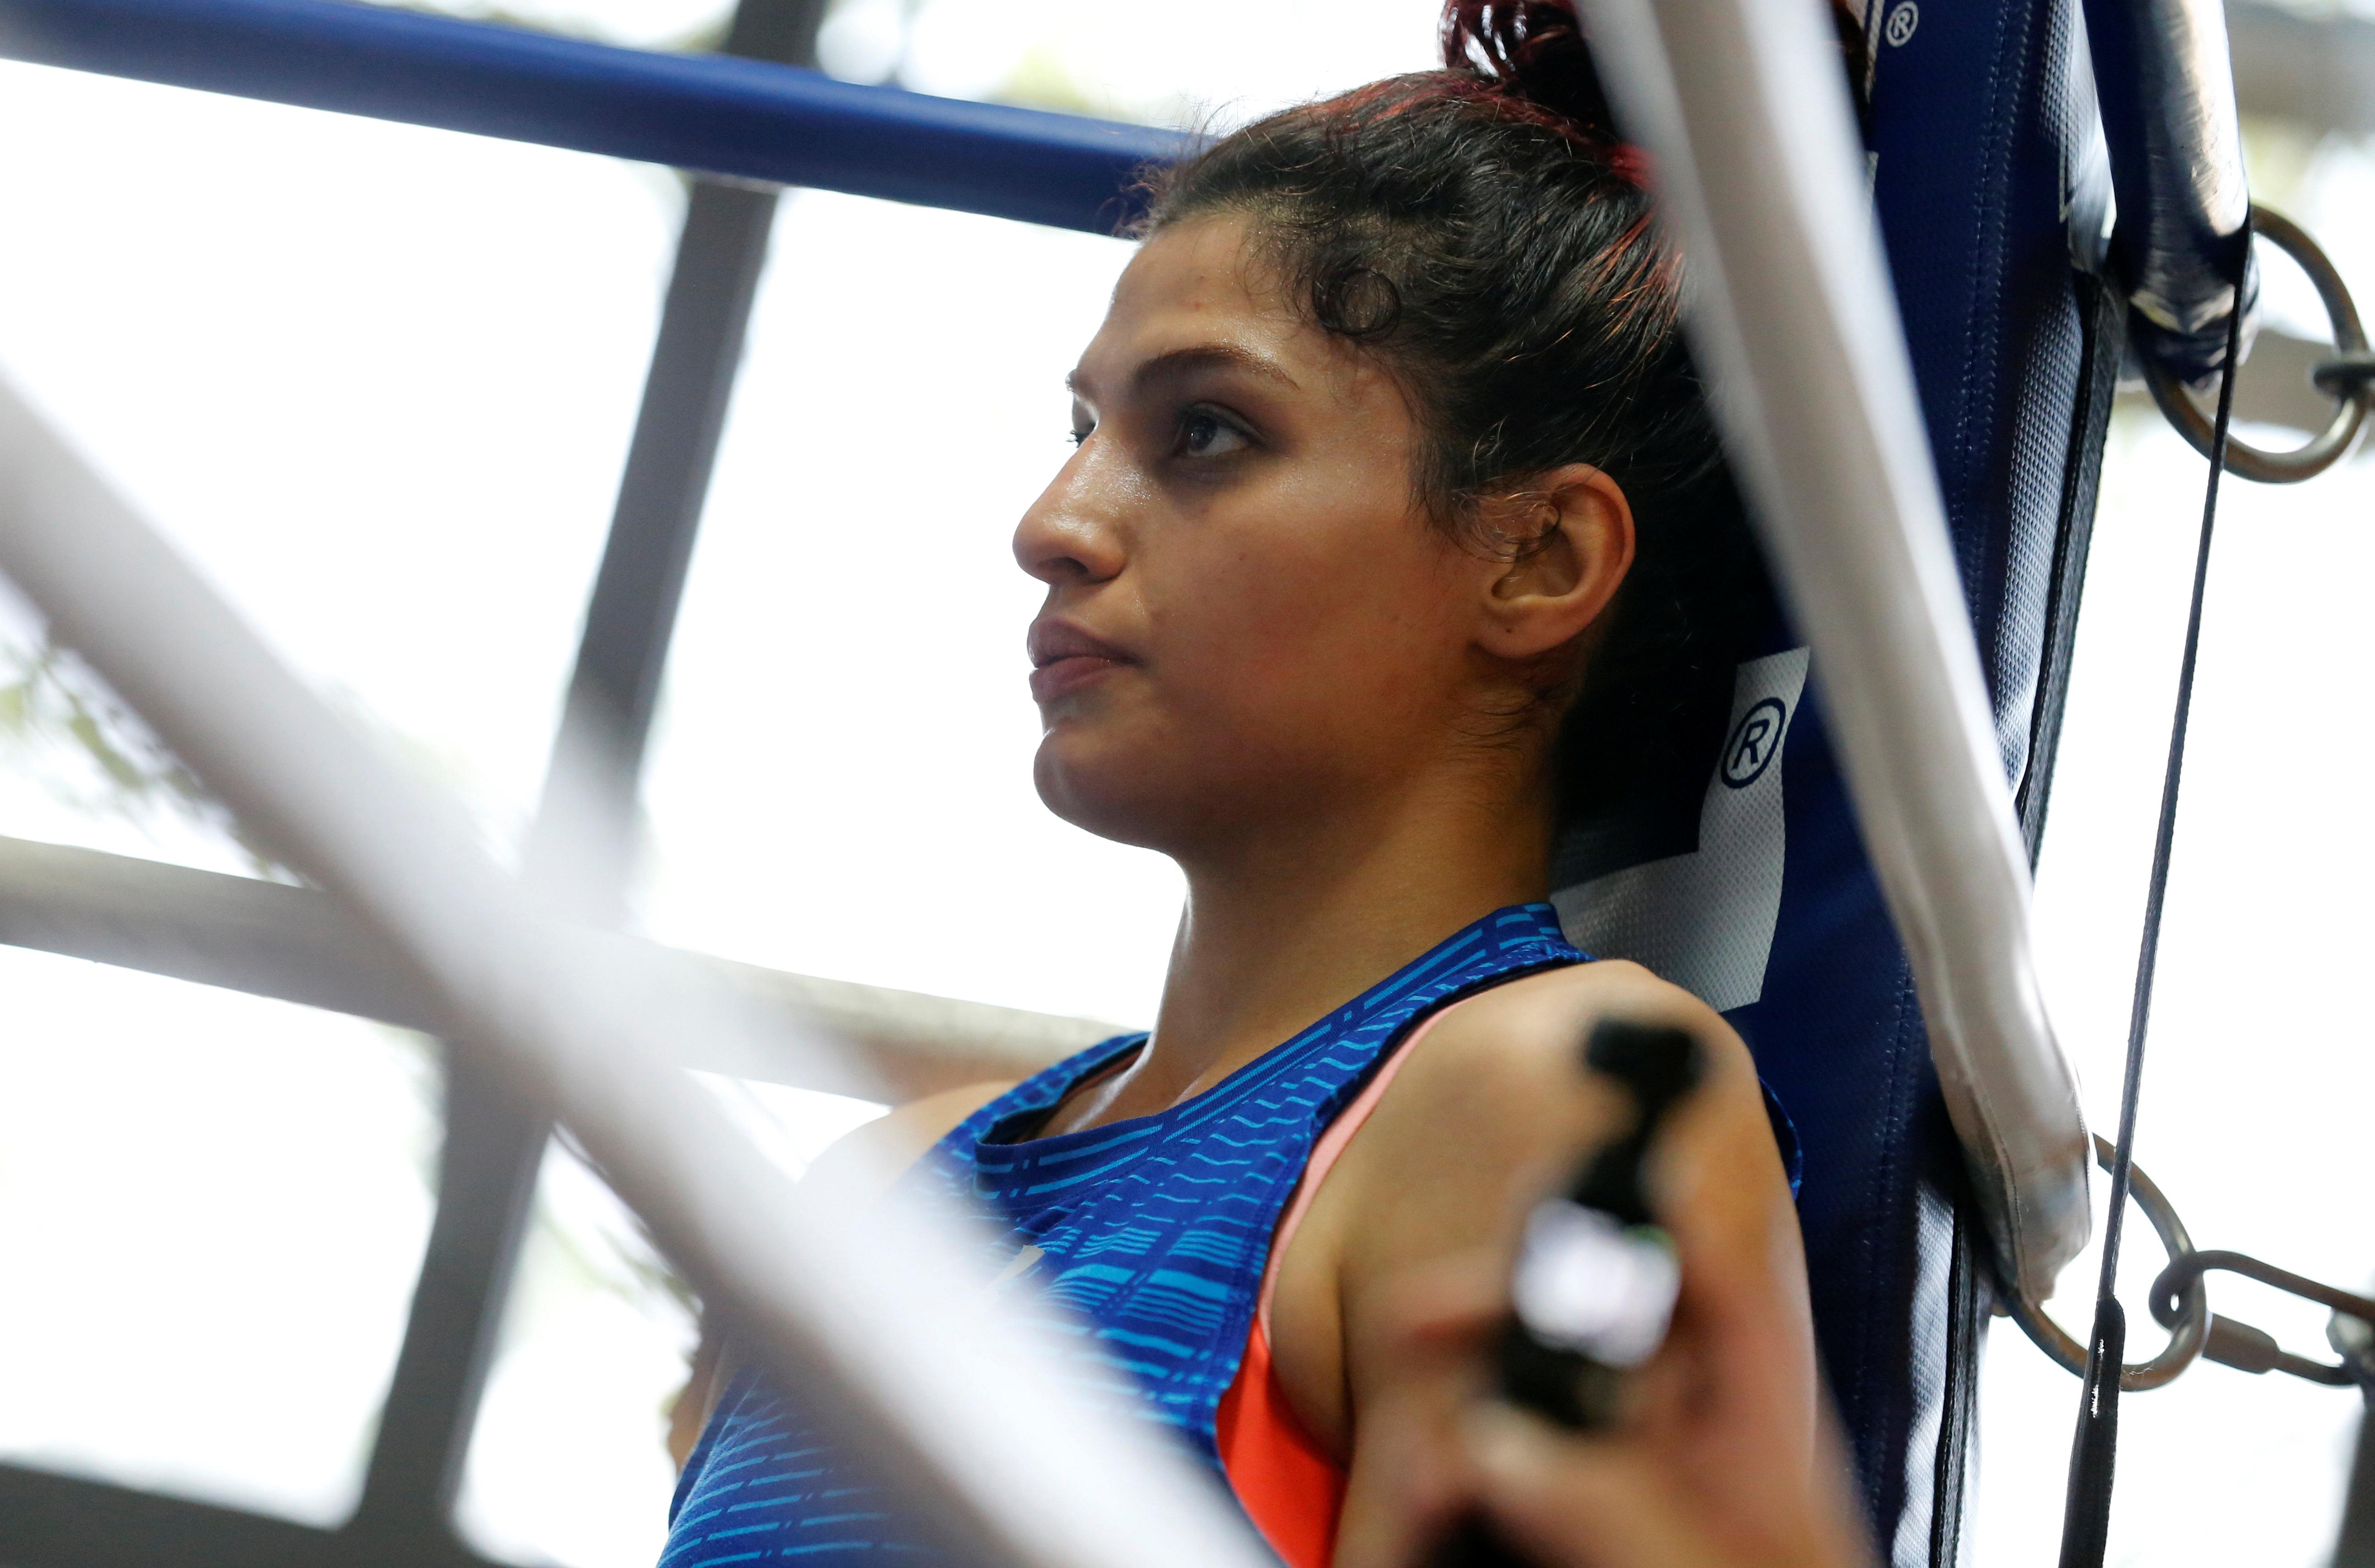 Boxe - Sadaf Khadem, au nom des femmes d'Iran